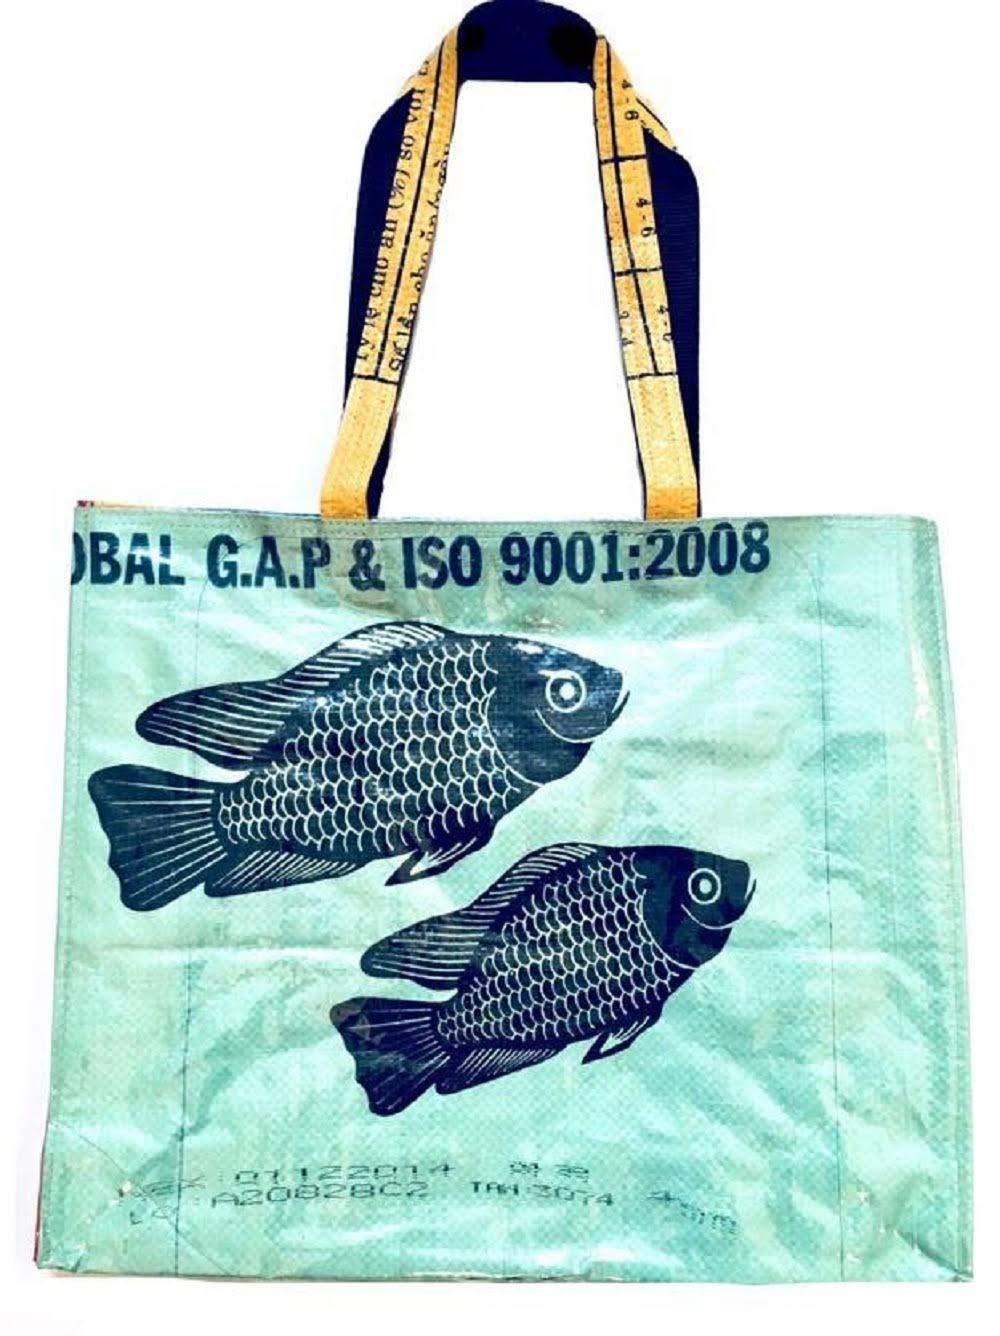 Serado エコフレンドリー リサイクル食料品バッグ/ショッピング/ビーチトート - リサイクルセメント&フィードバッグからカンボジアで手作り - 再利用可能で丈夫 B07GNP9SDB Green w/ Black Fish